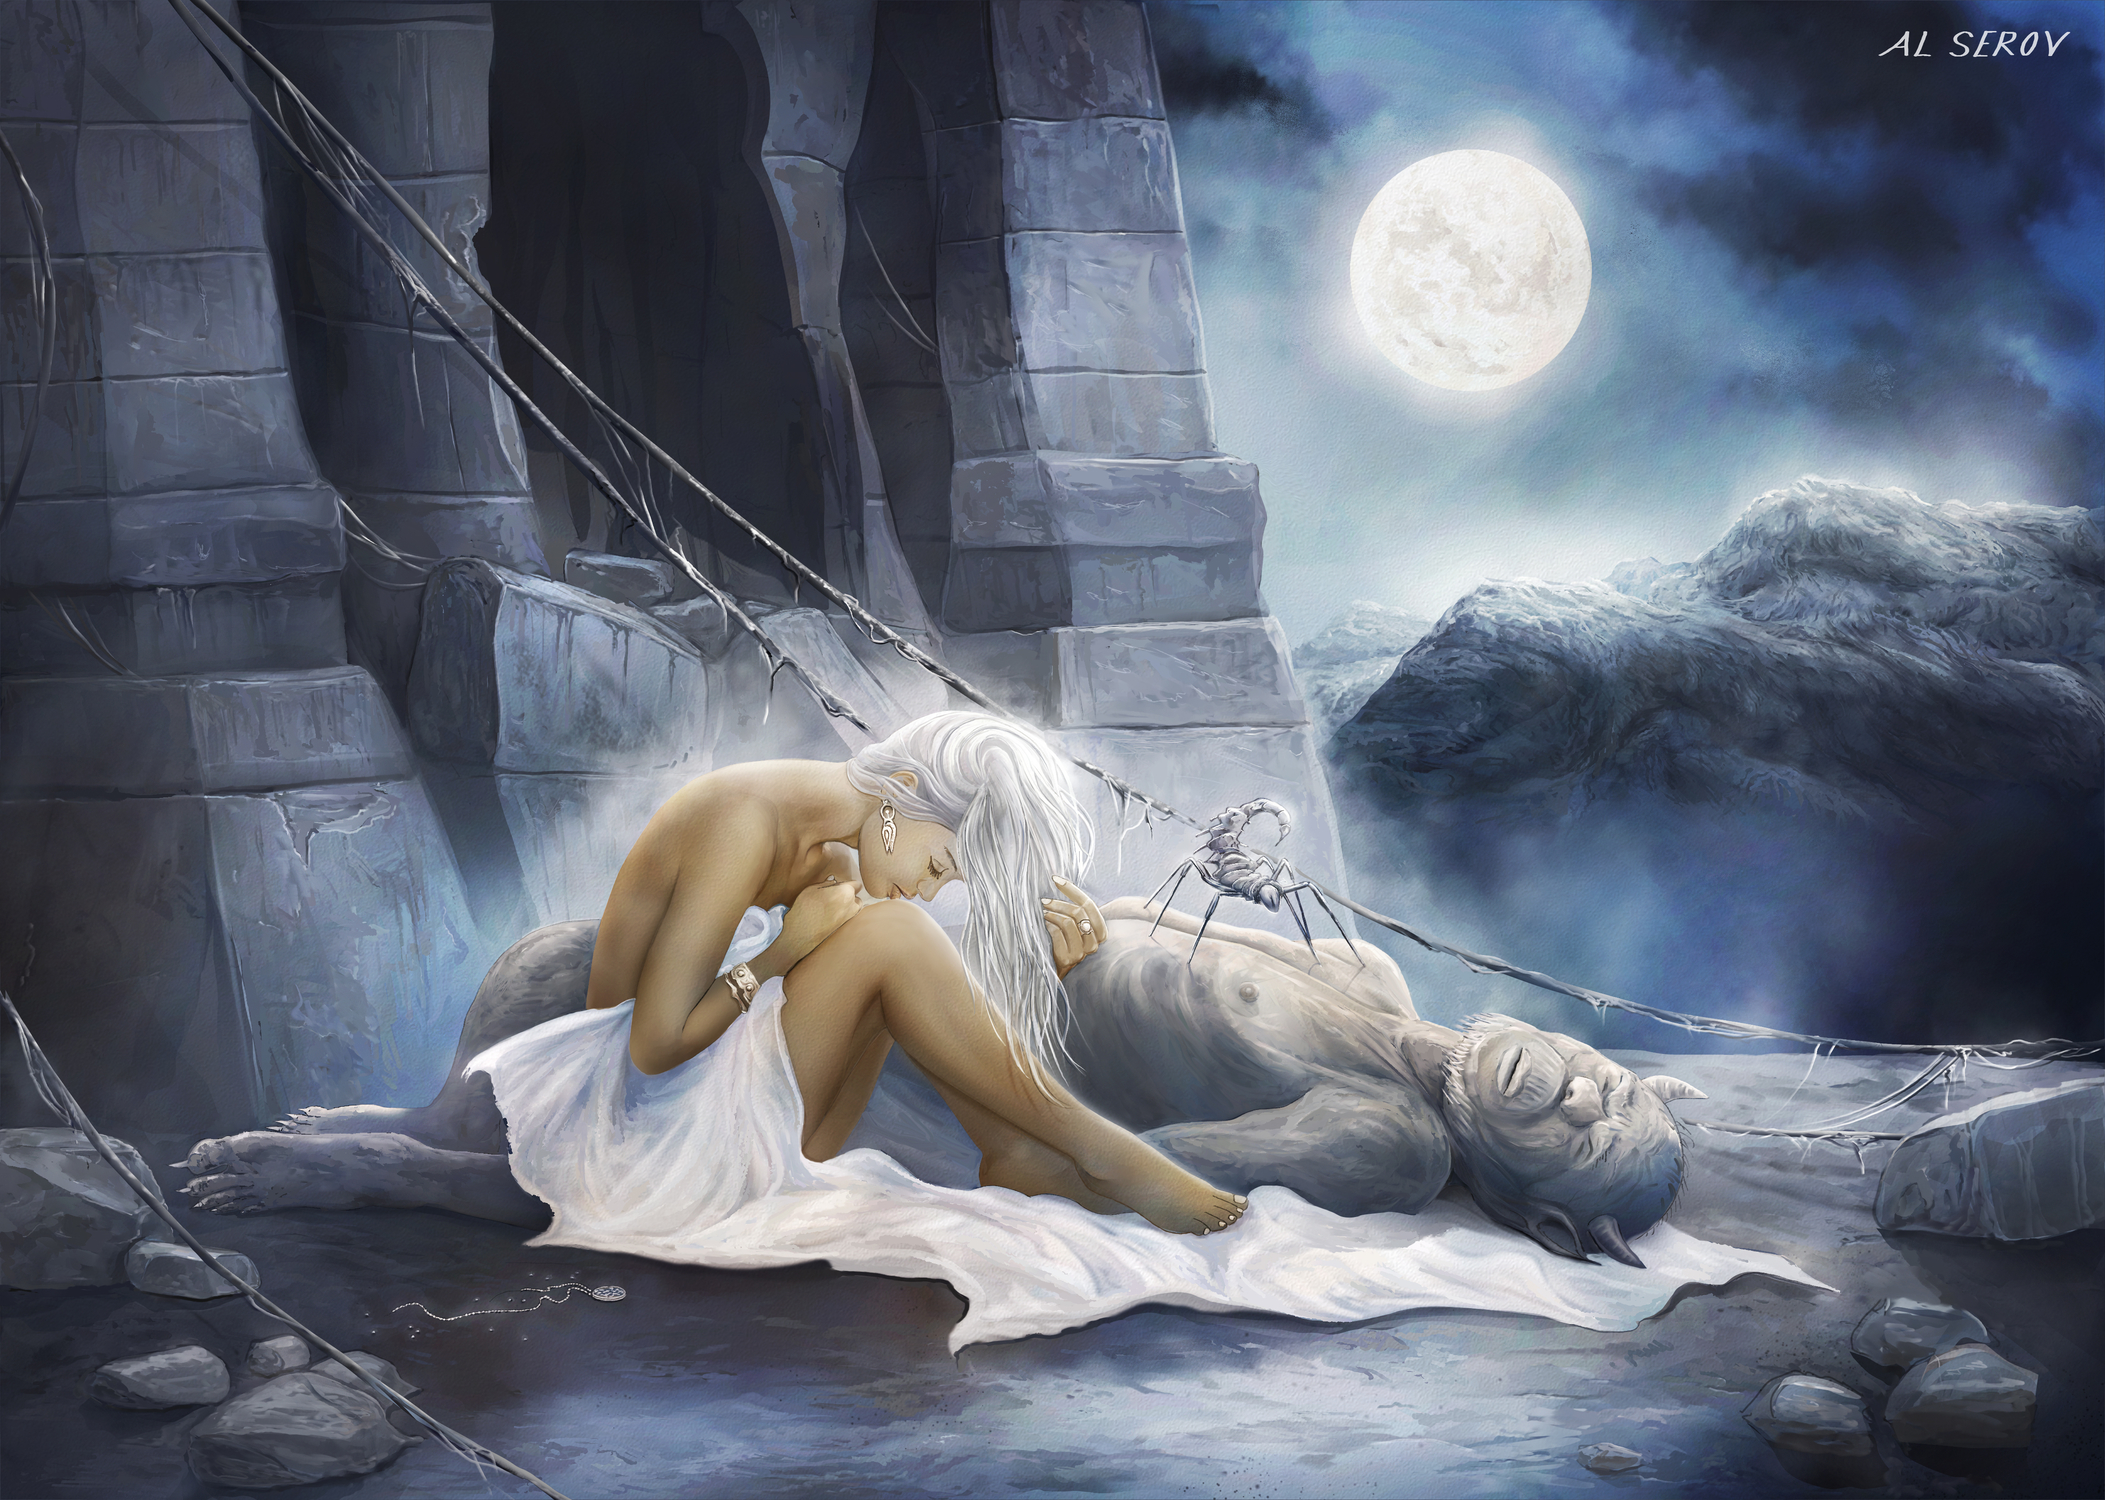 Loss of Sensation Artwork by Al Serov